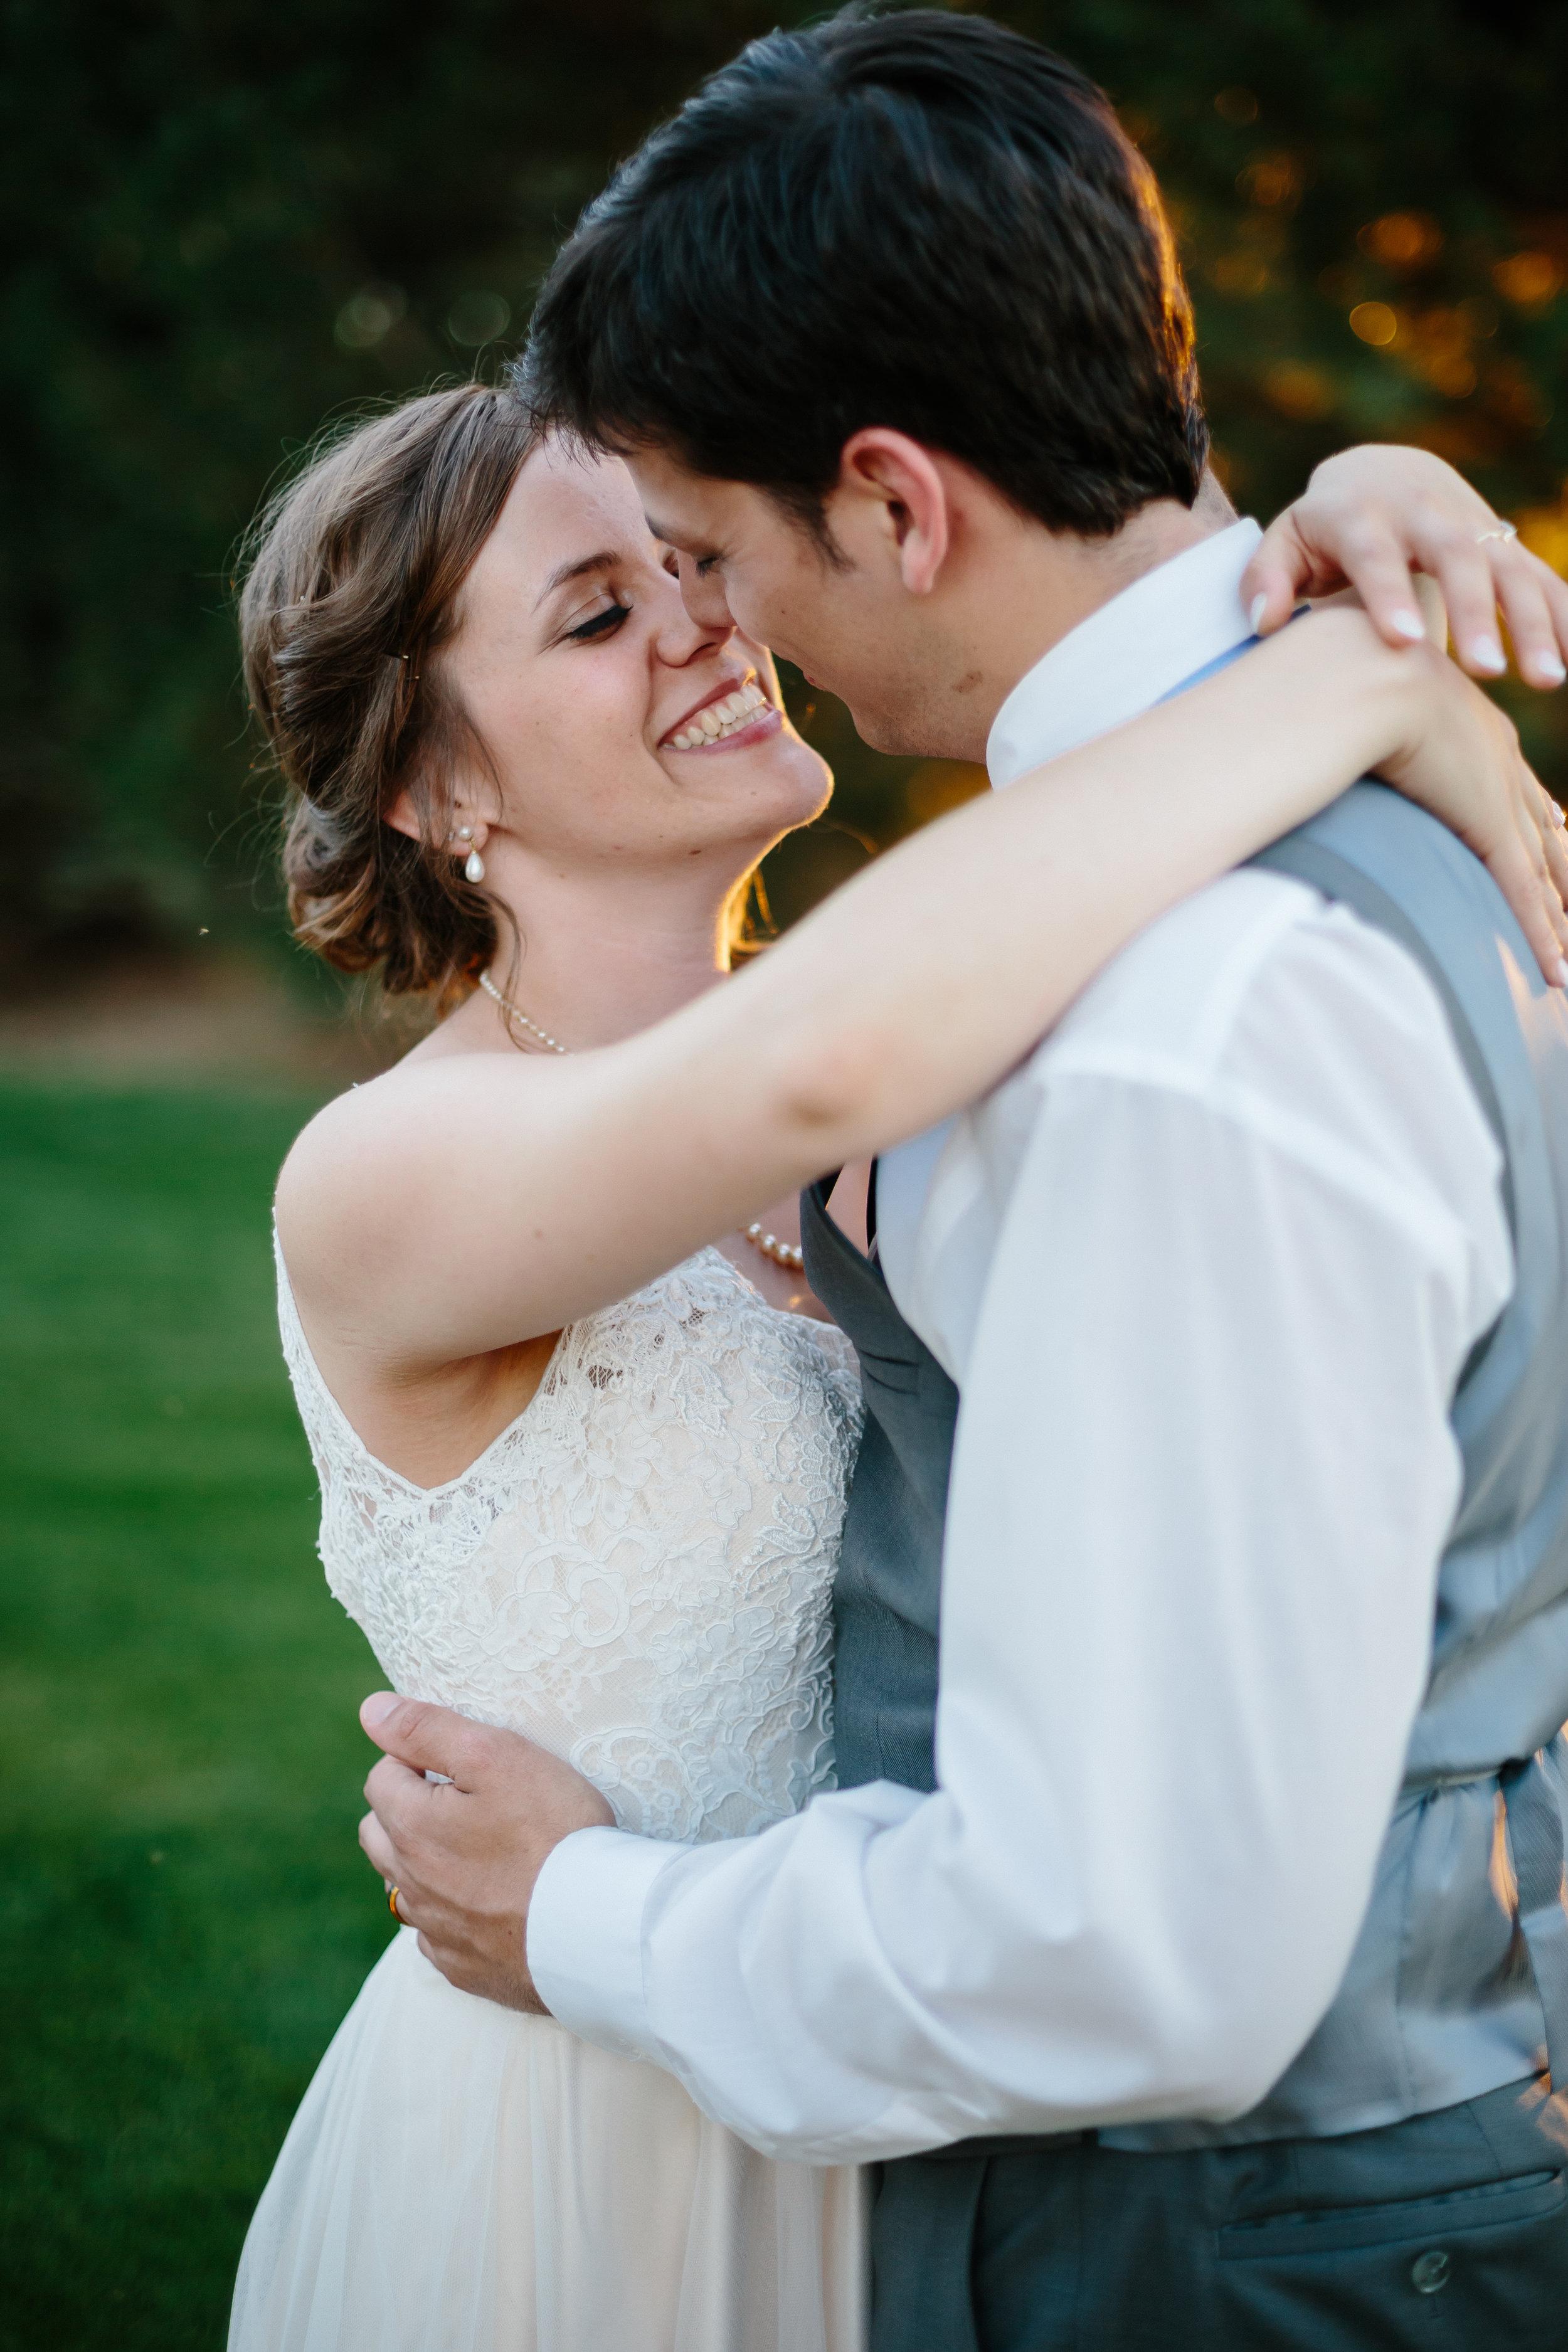 Jordan & Shantel Married - Idaho - Corrie Mick Photography-194.jpg